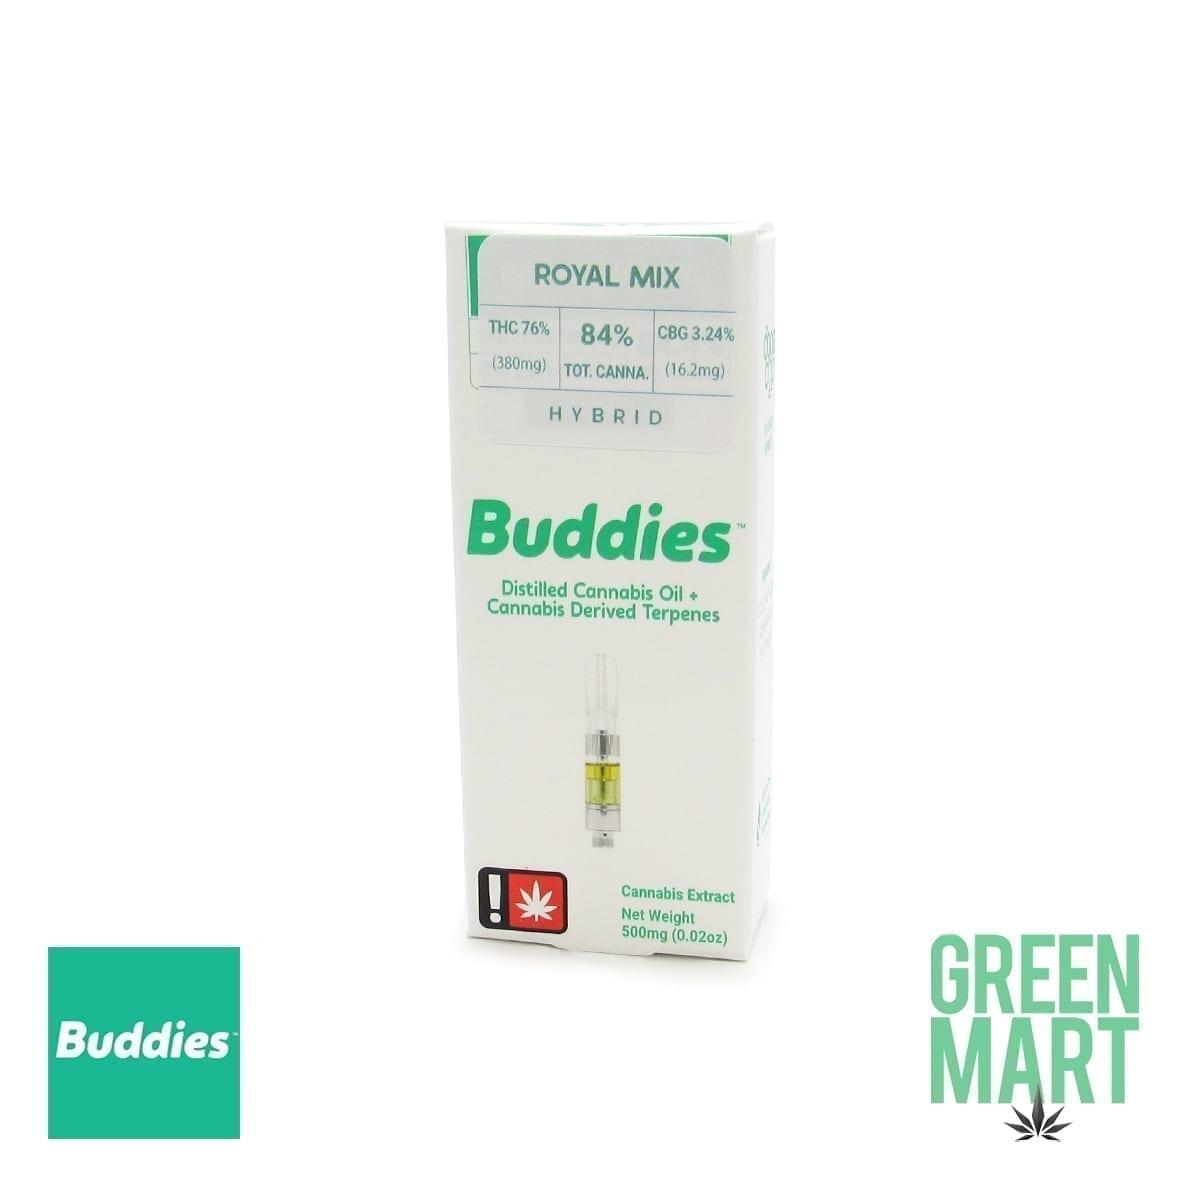 Buddies Brand Distillate Cartridge - Royal Mix